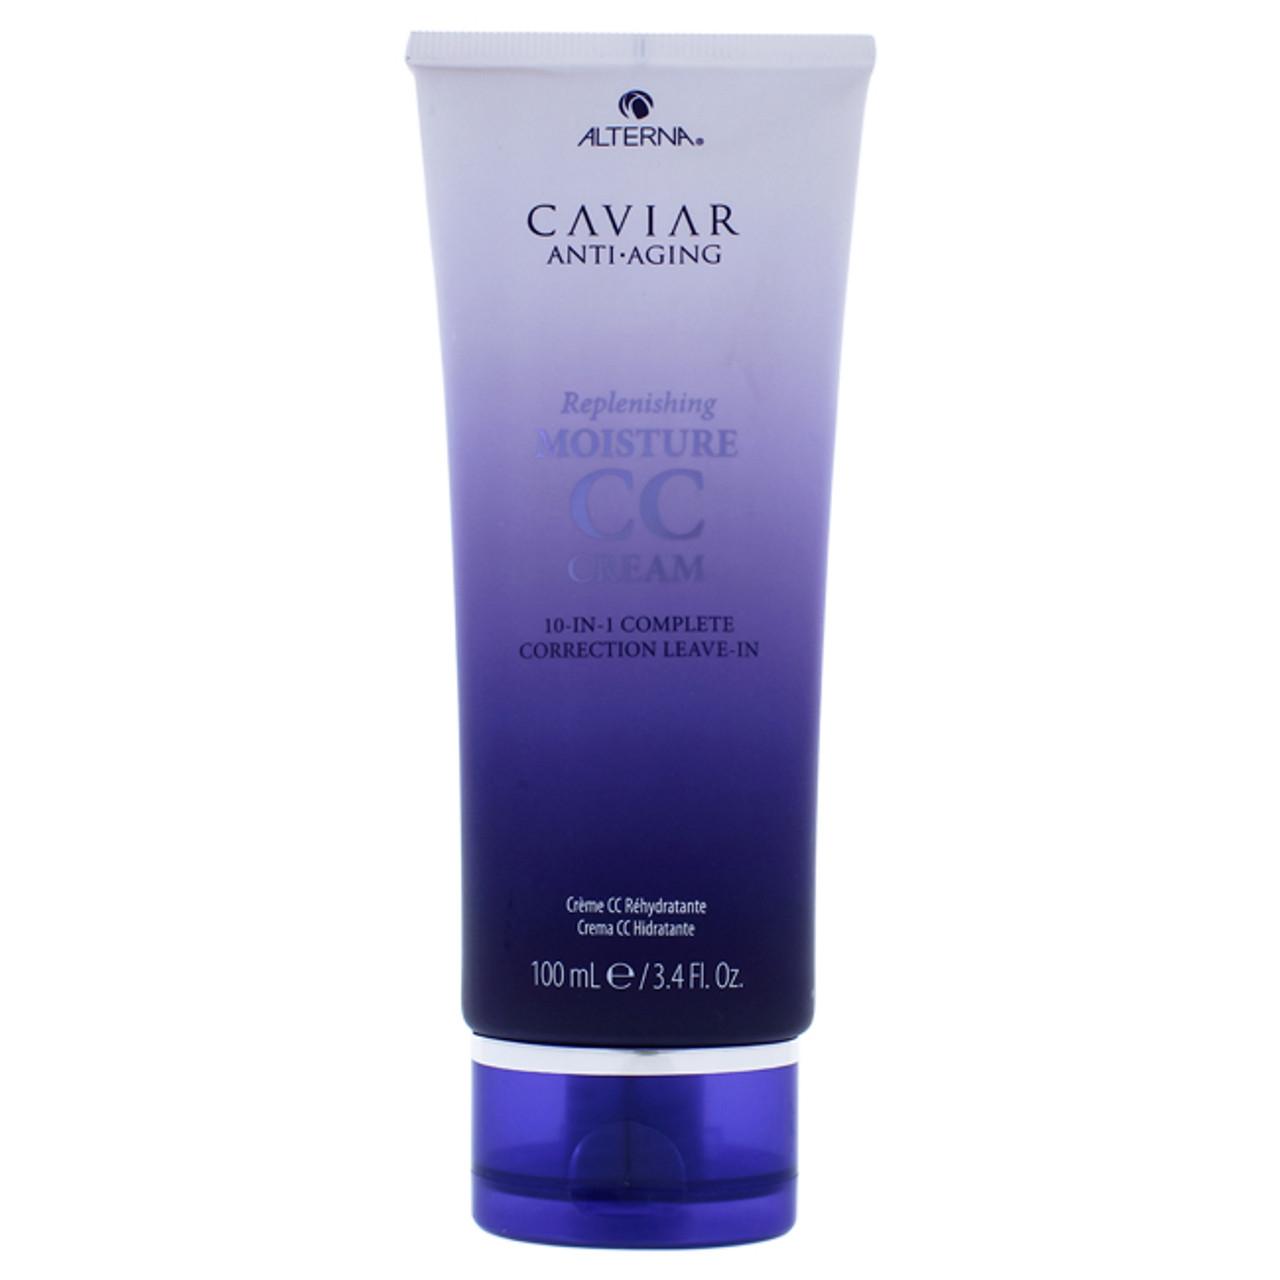 Alterna Caviar Anti-aging CC Cream 3.4 oz